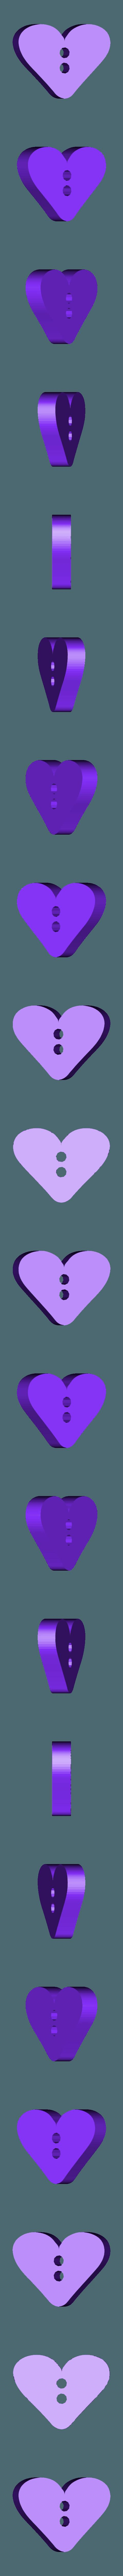 Heart Button.stl Download free STL file Heart Button • 3D printable design, Lucy_Haribert